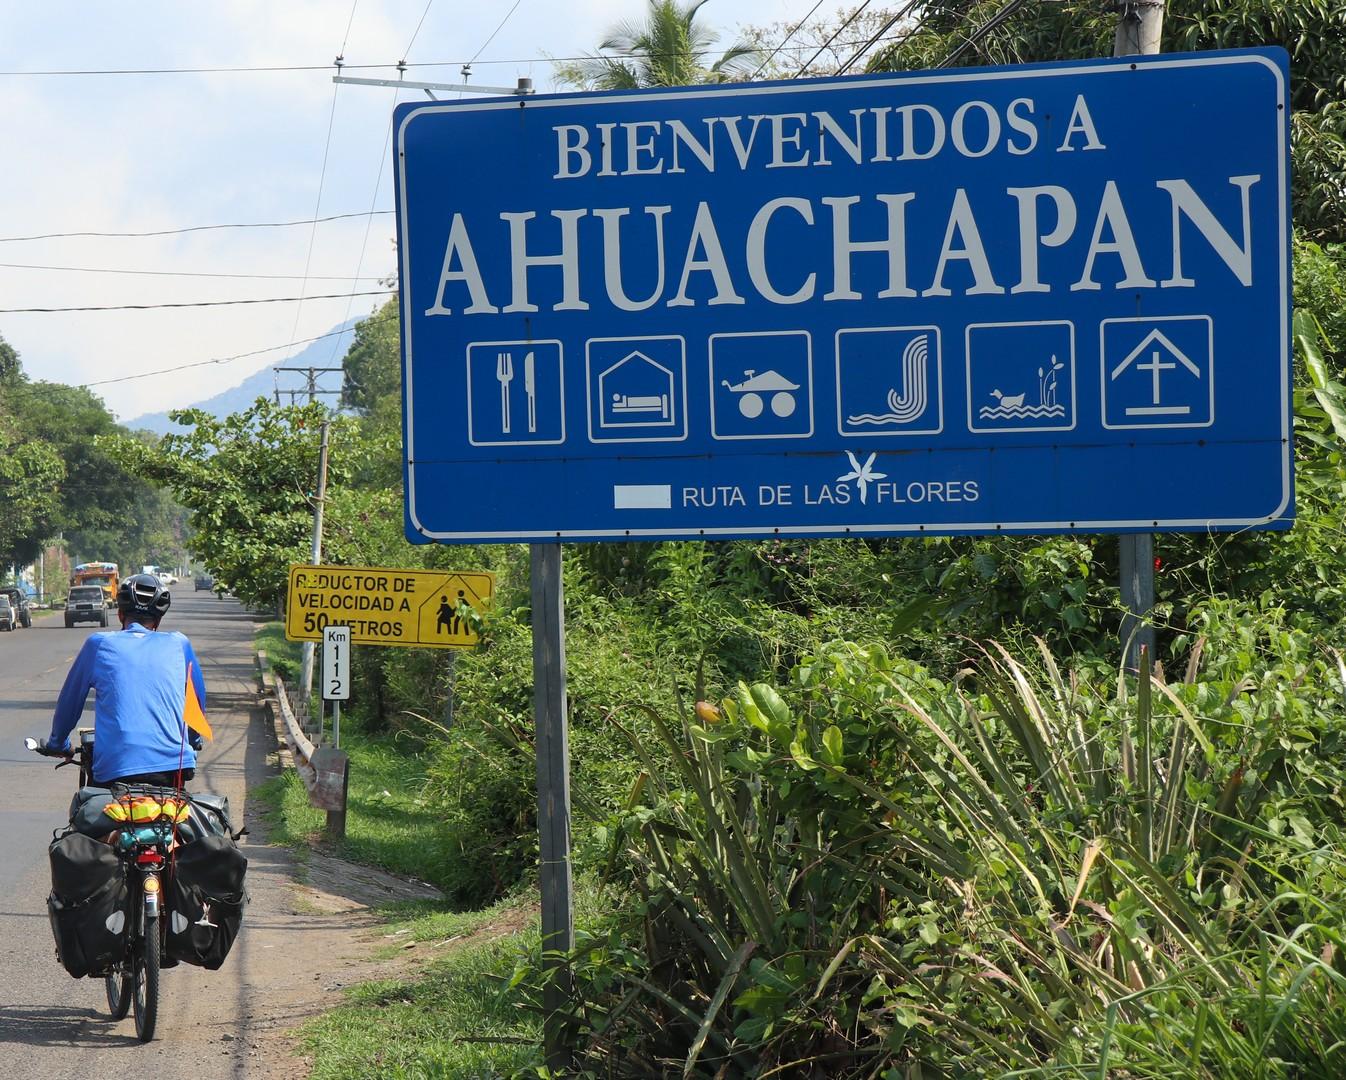 2018-05-05 Jalpatagua_Ahuachapan-27